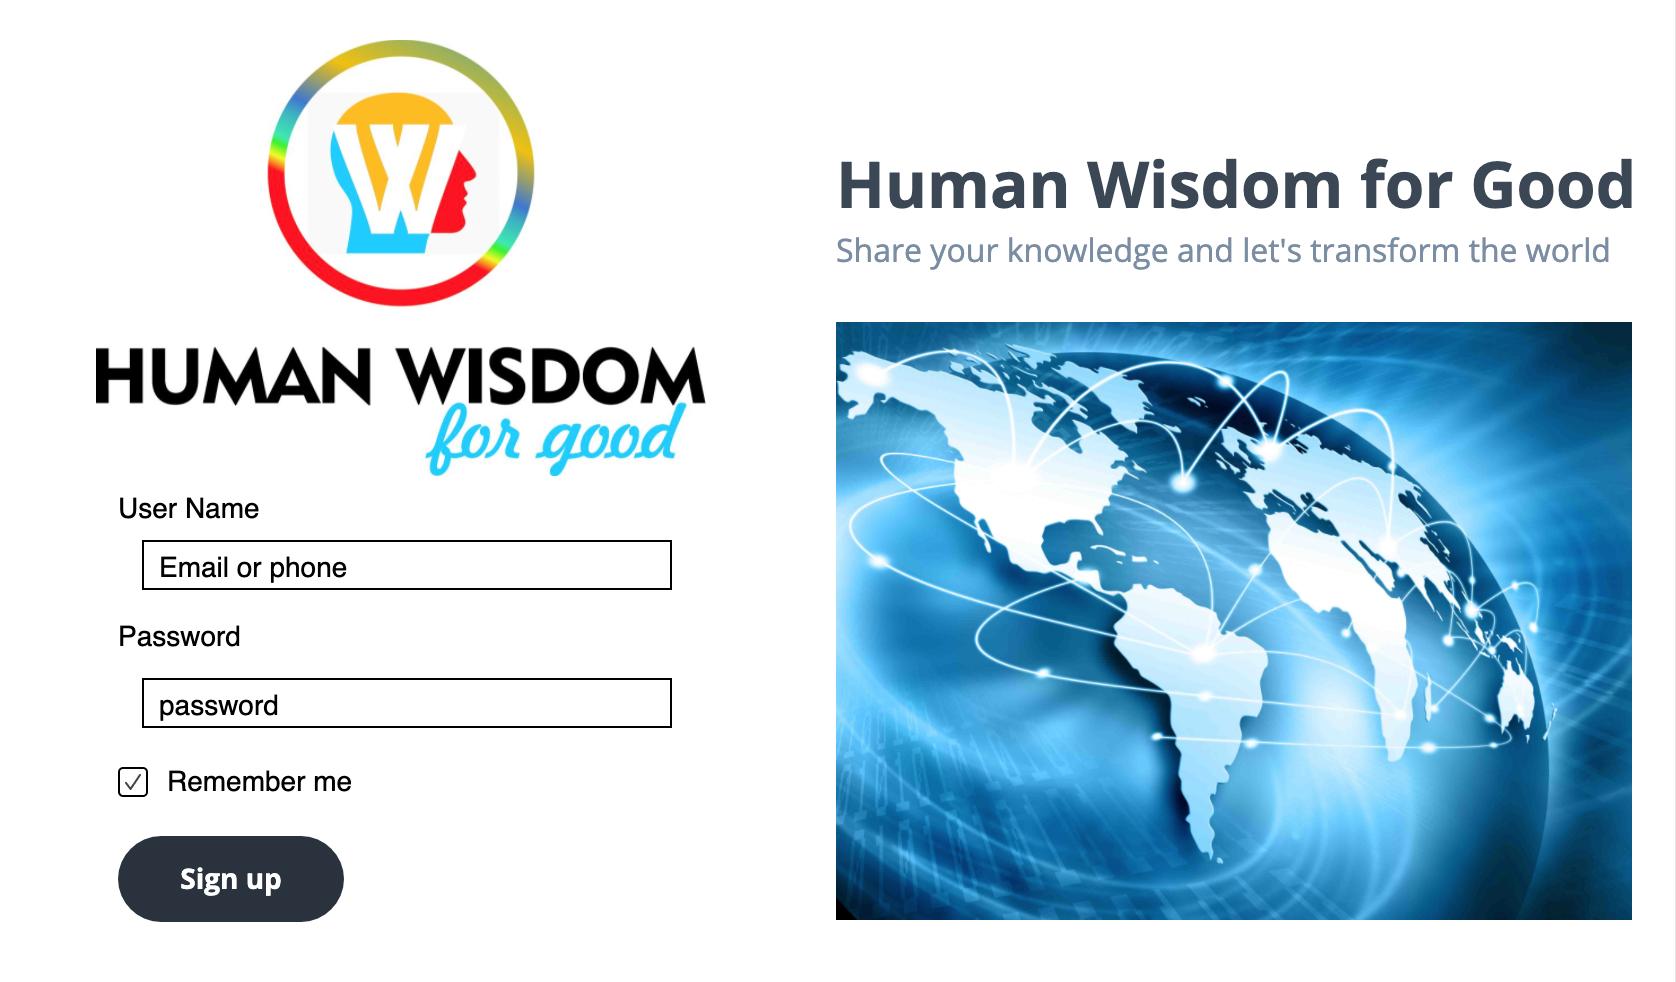 Human Wisdom for Good